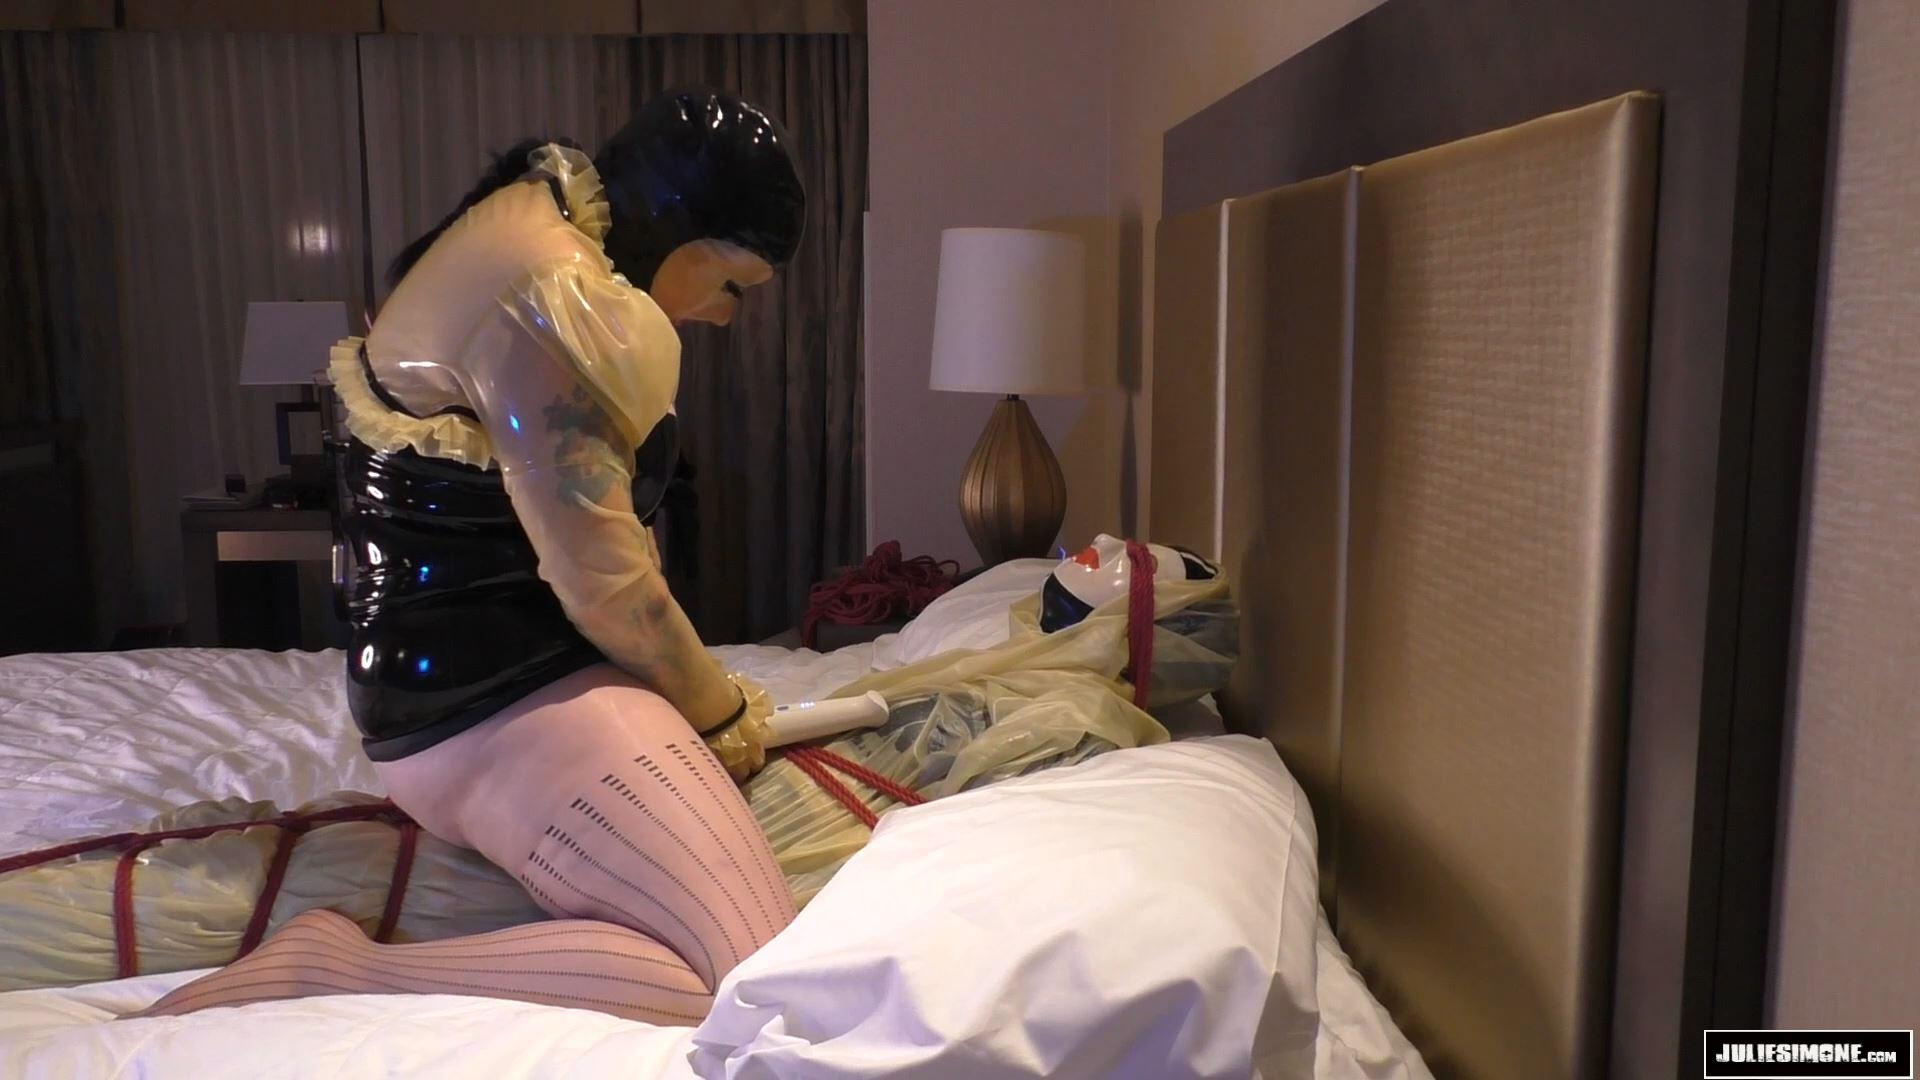 Julie Simone In Scene: Rubber Lover Part 2 Bound Orgasm Race - JULIESIMONE - FULL HD/1080p/MP4